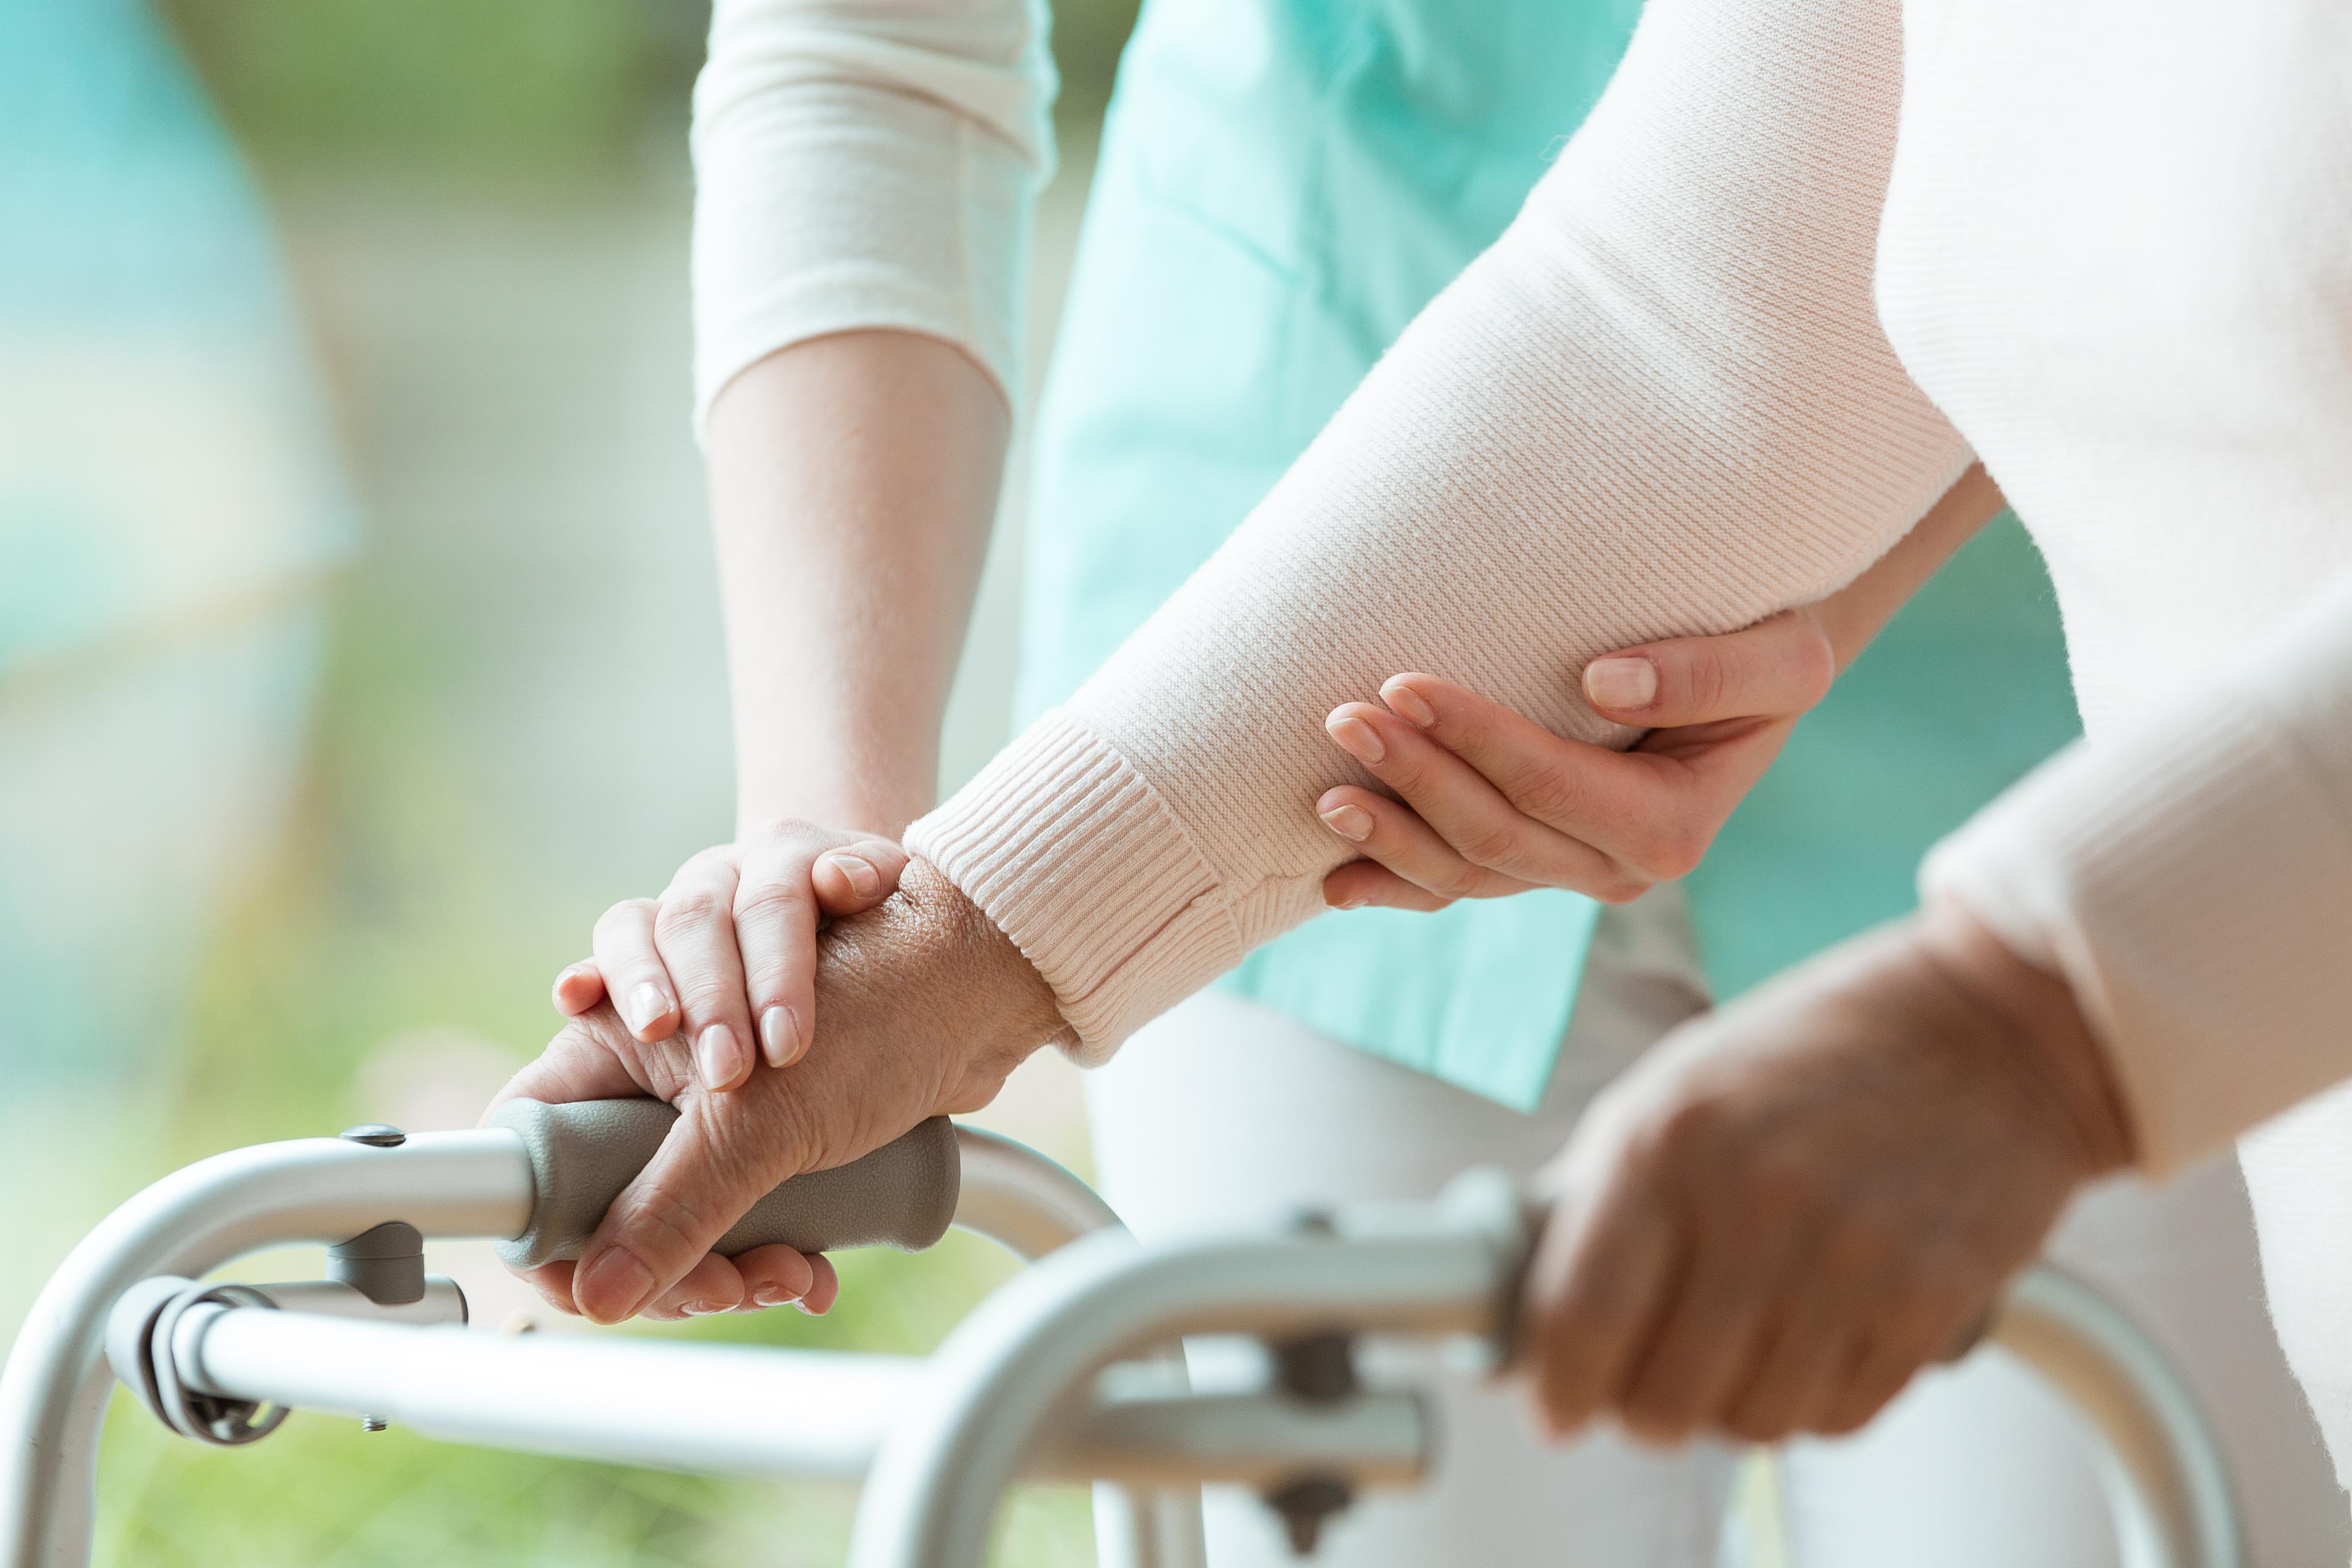 nurse helping elderly woman with metal walker